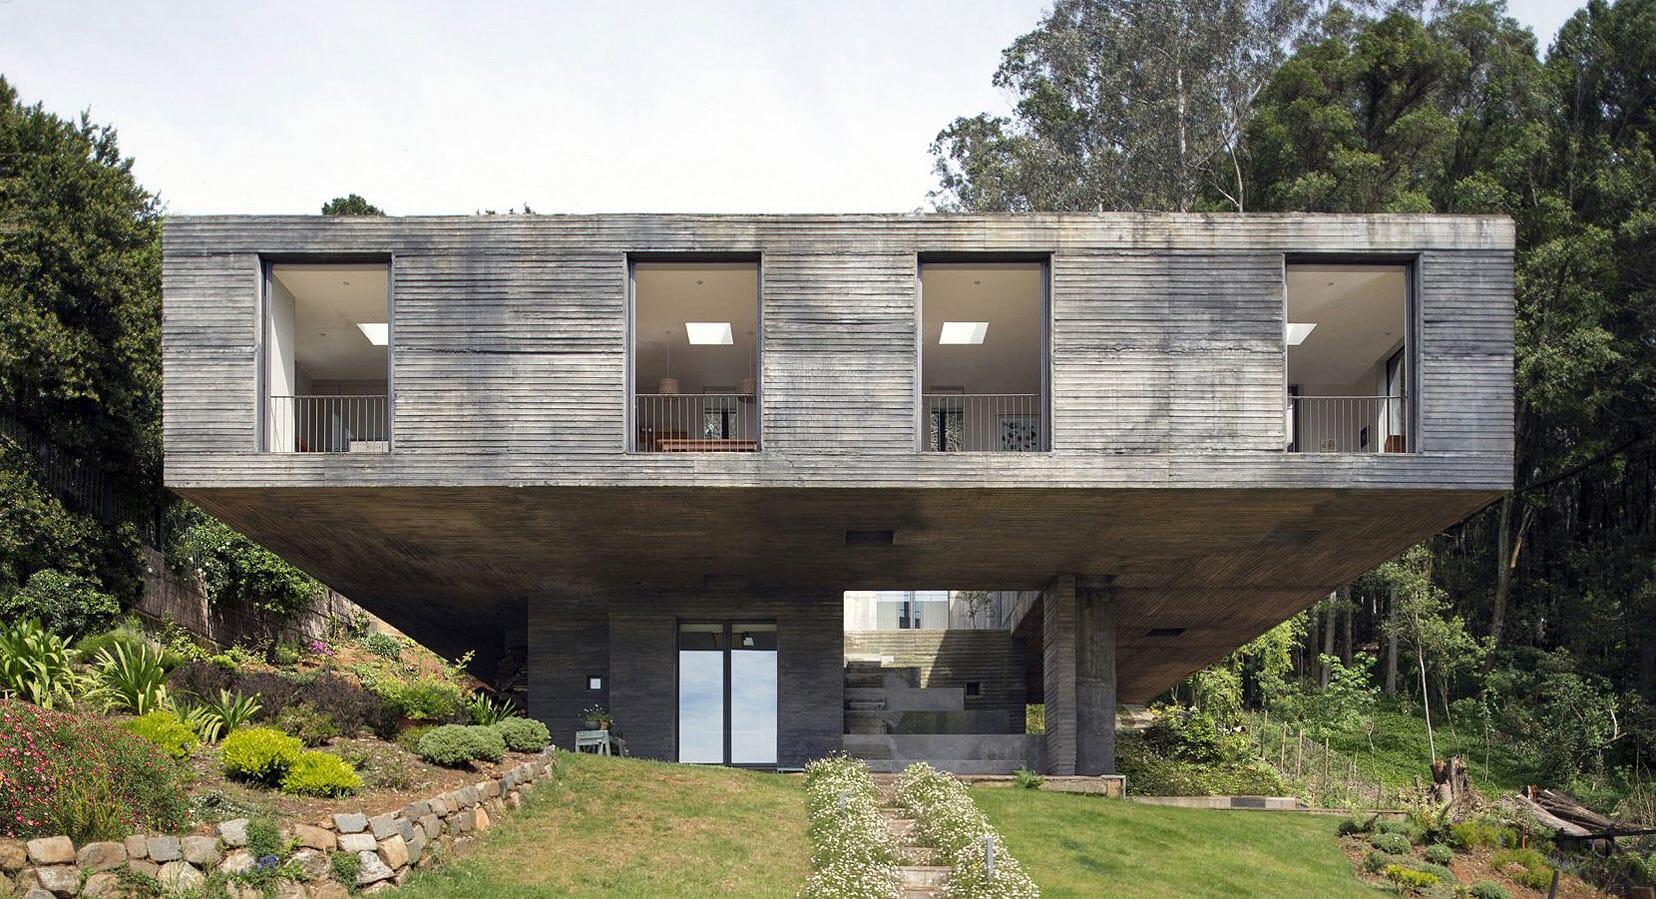 Balance Of Beauty: The Guna House by Pezo von Ellrichshausen